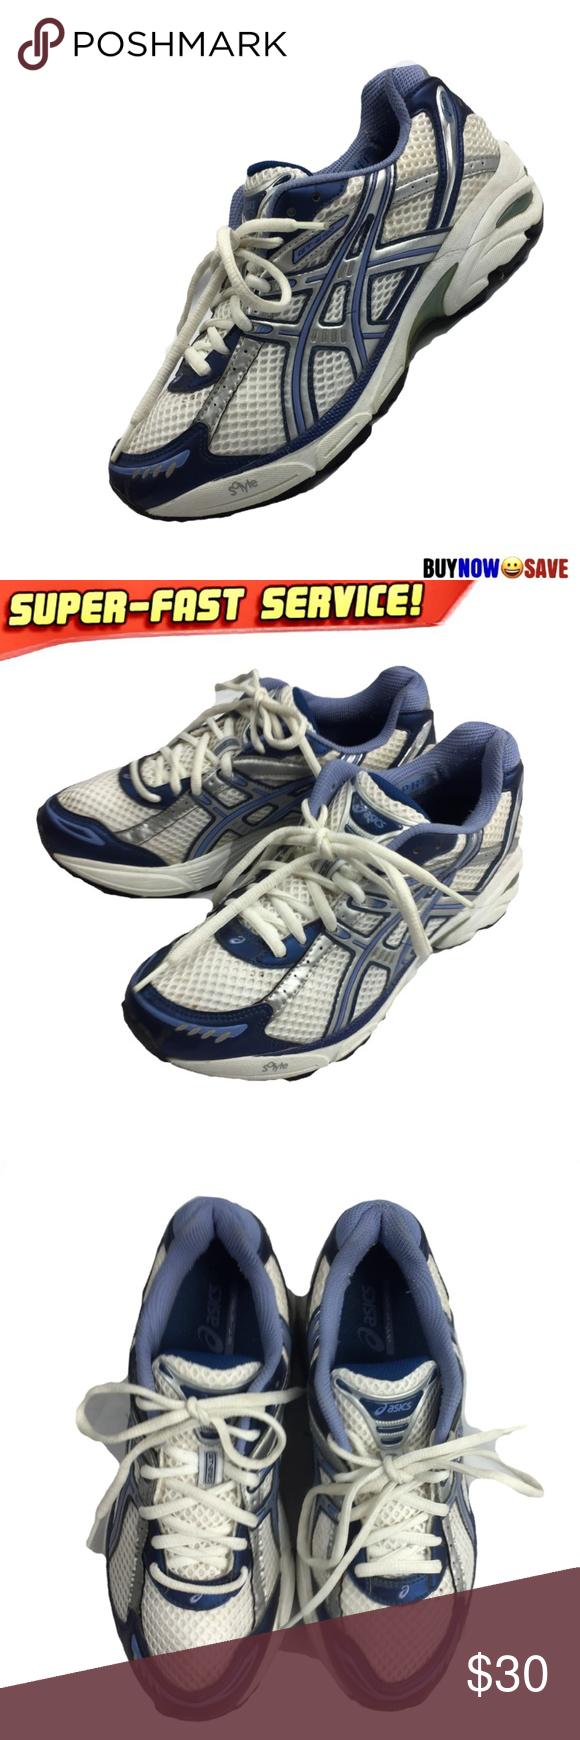 Asics Size 8 Gel GT 2120 Running Shoes